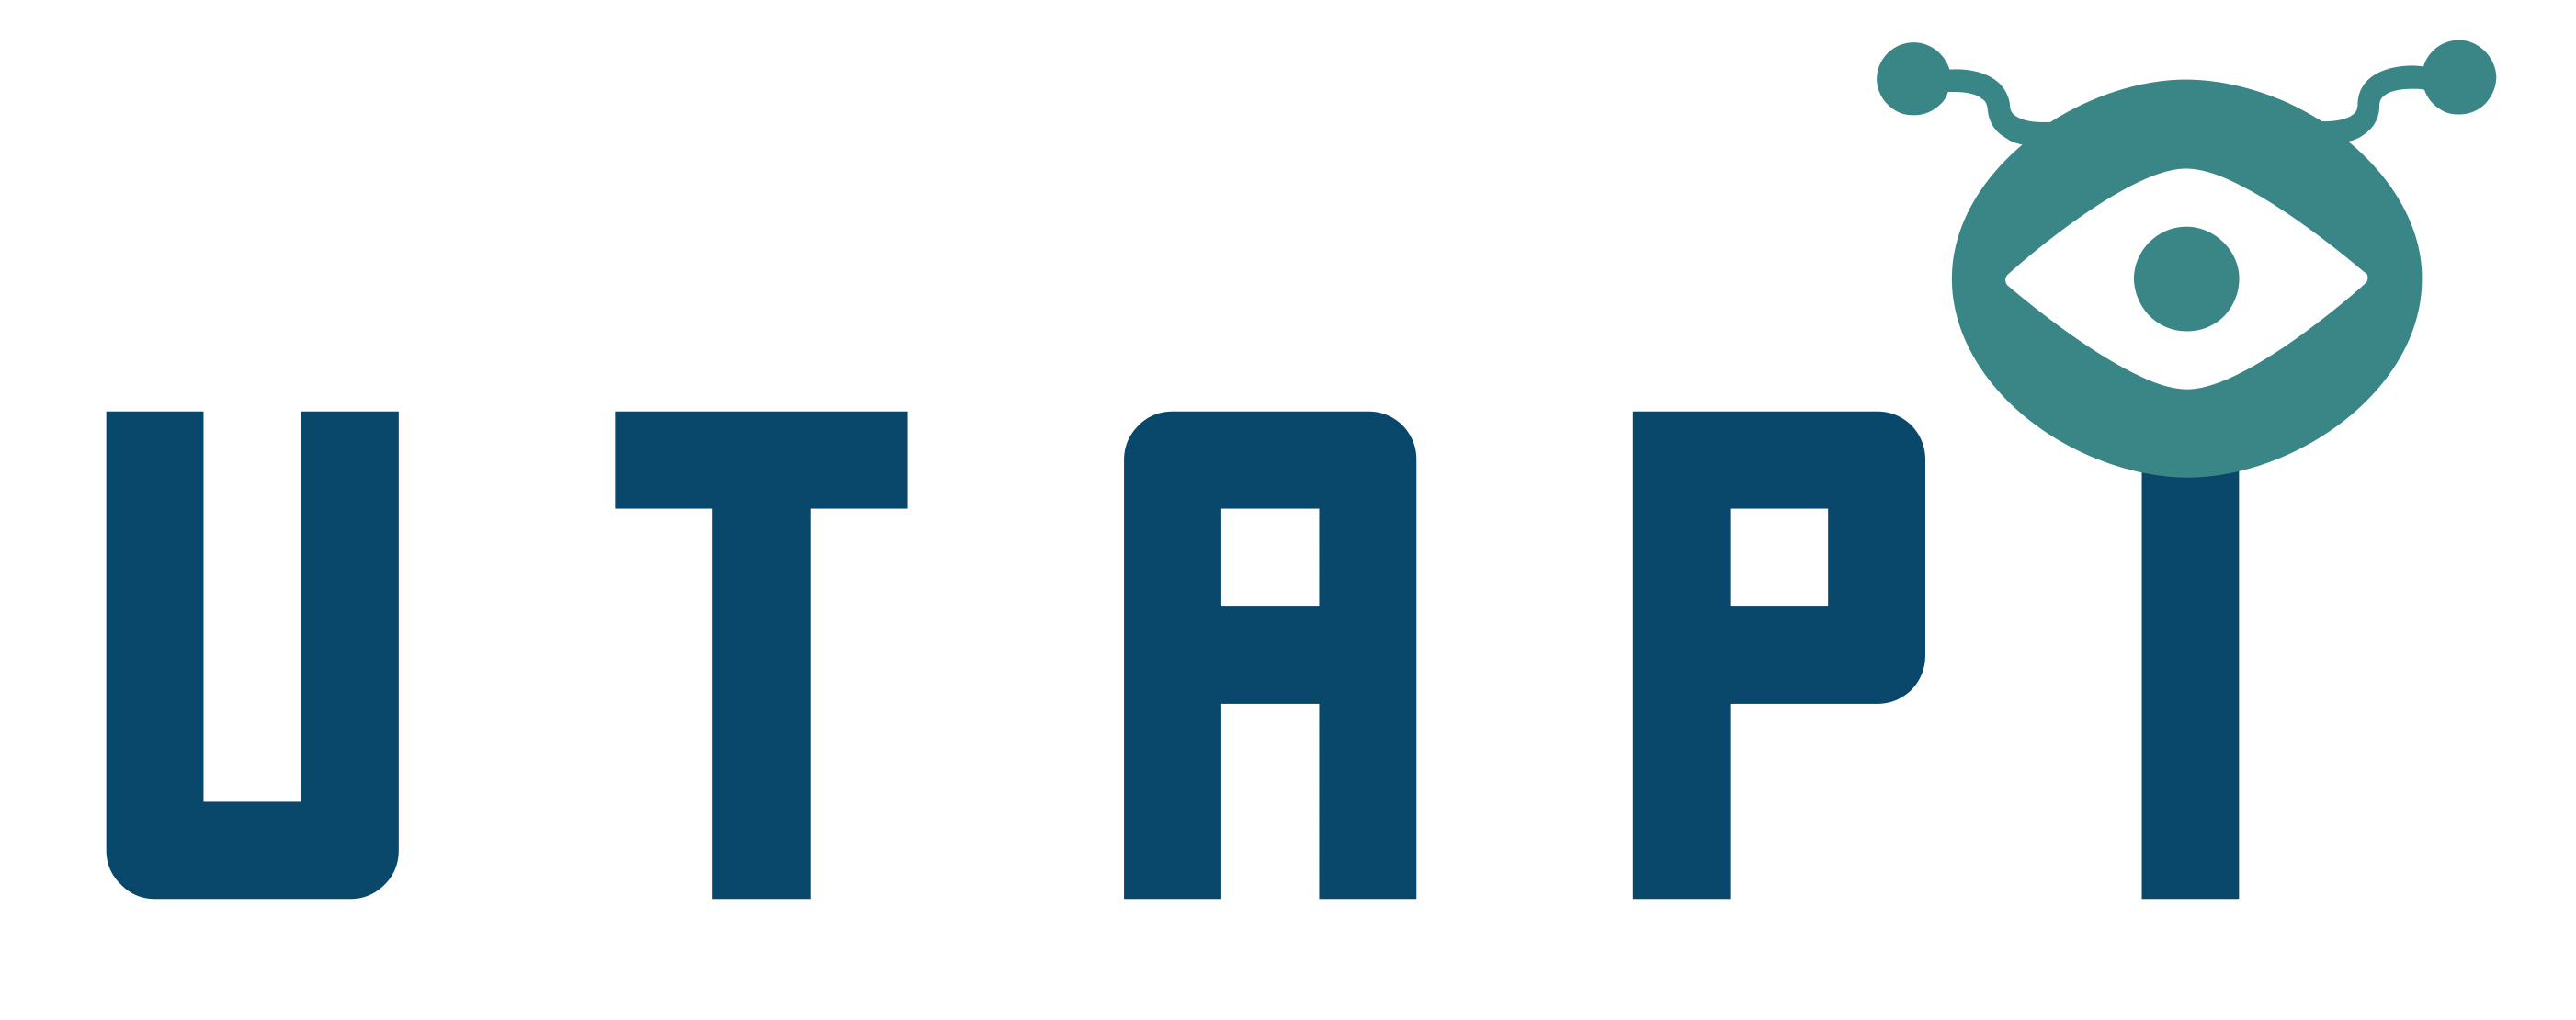 UTAPI CloudServer Integration — scality-utapi 7 0 0